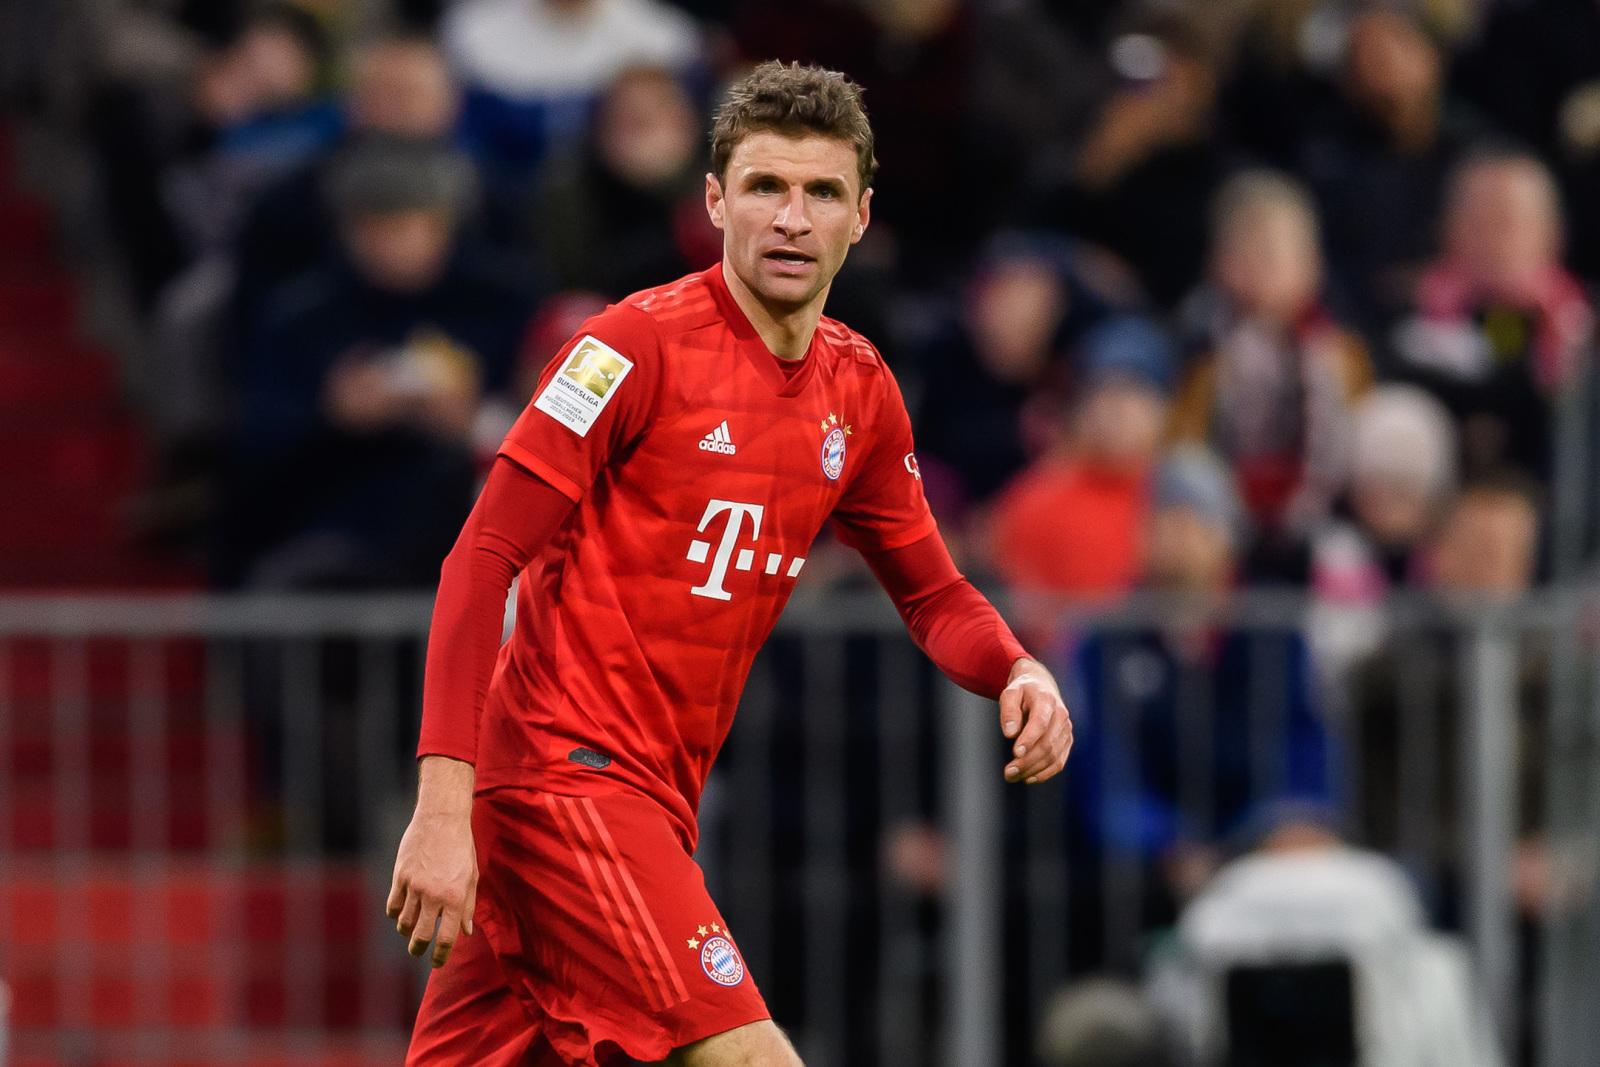 Bayern Munich Forward Thomas Muller Could Play For Germany